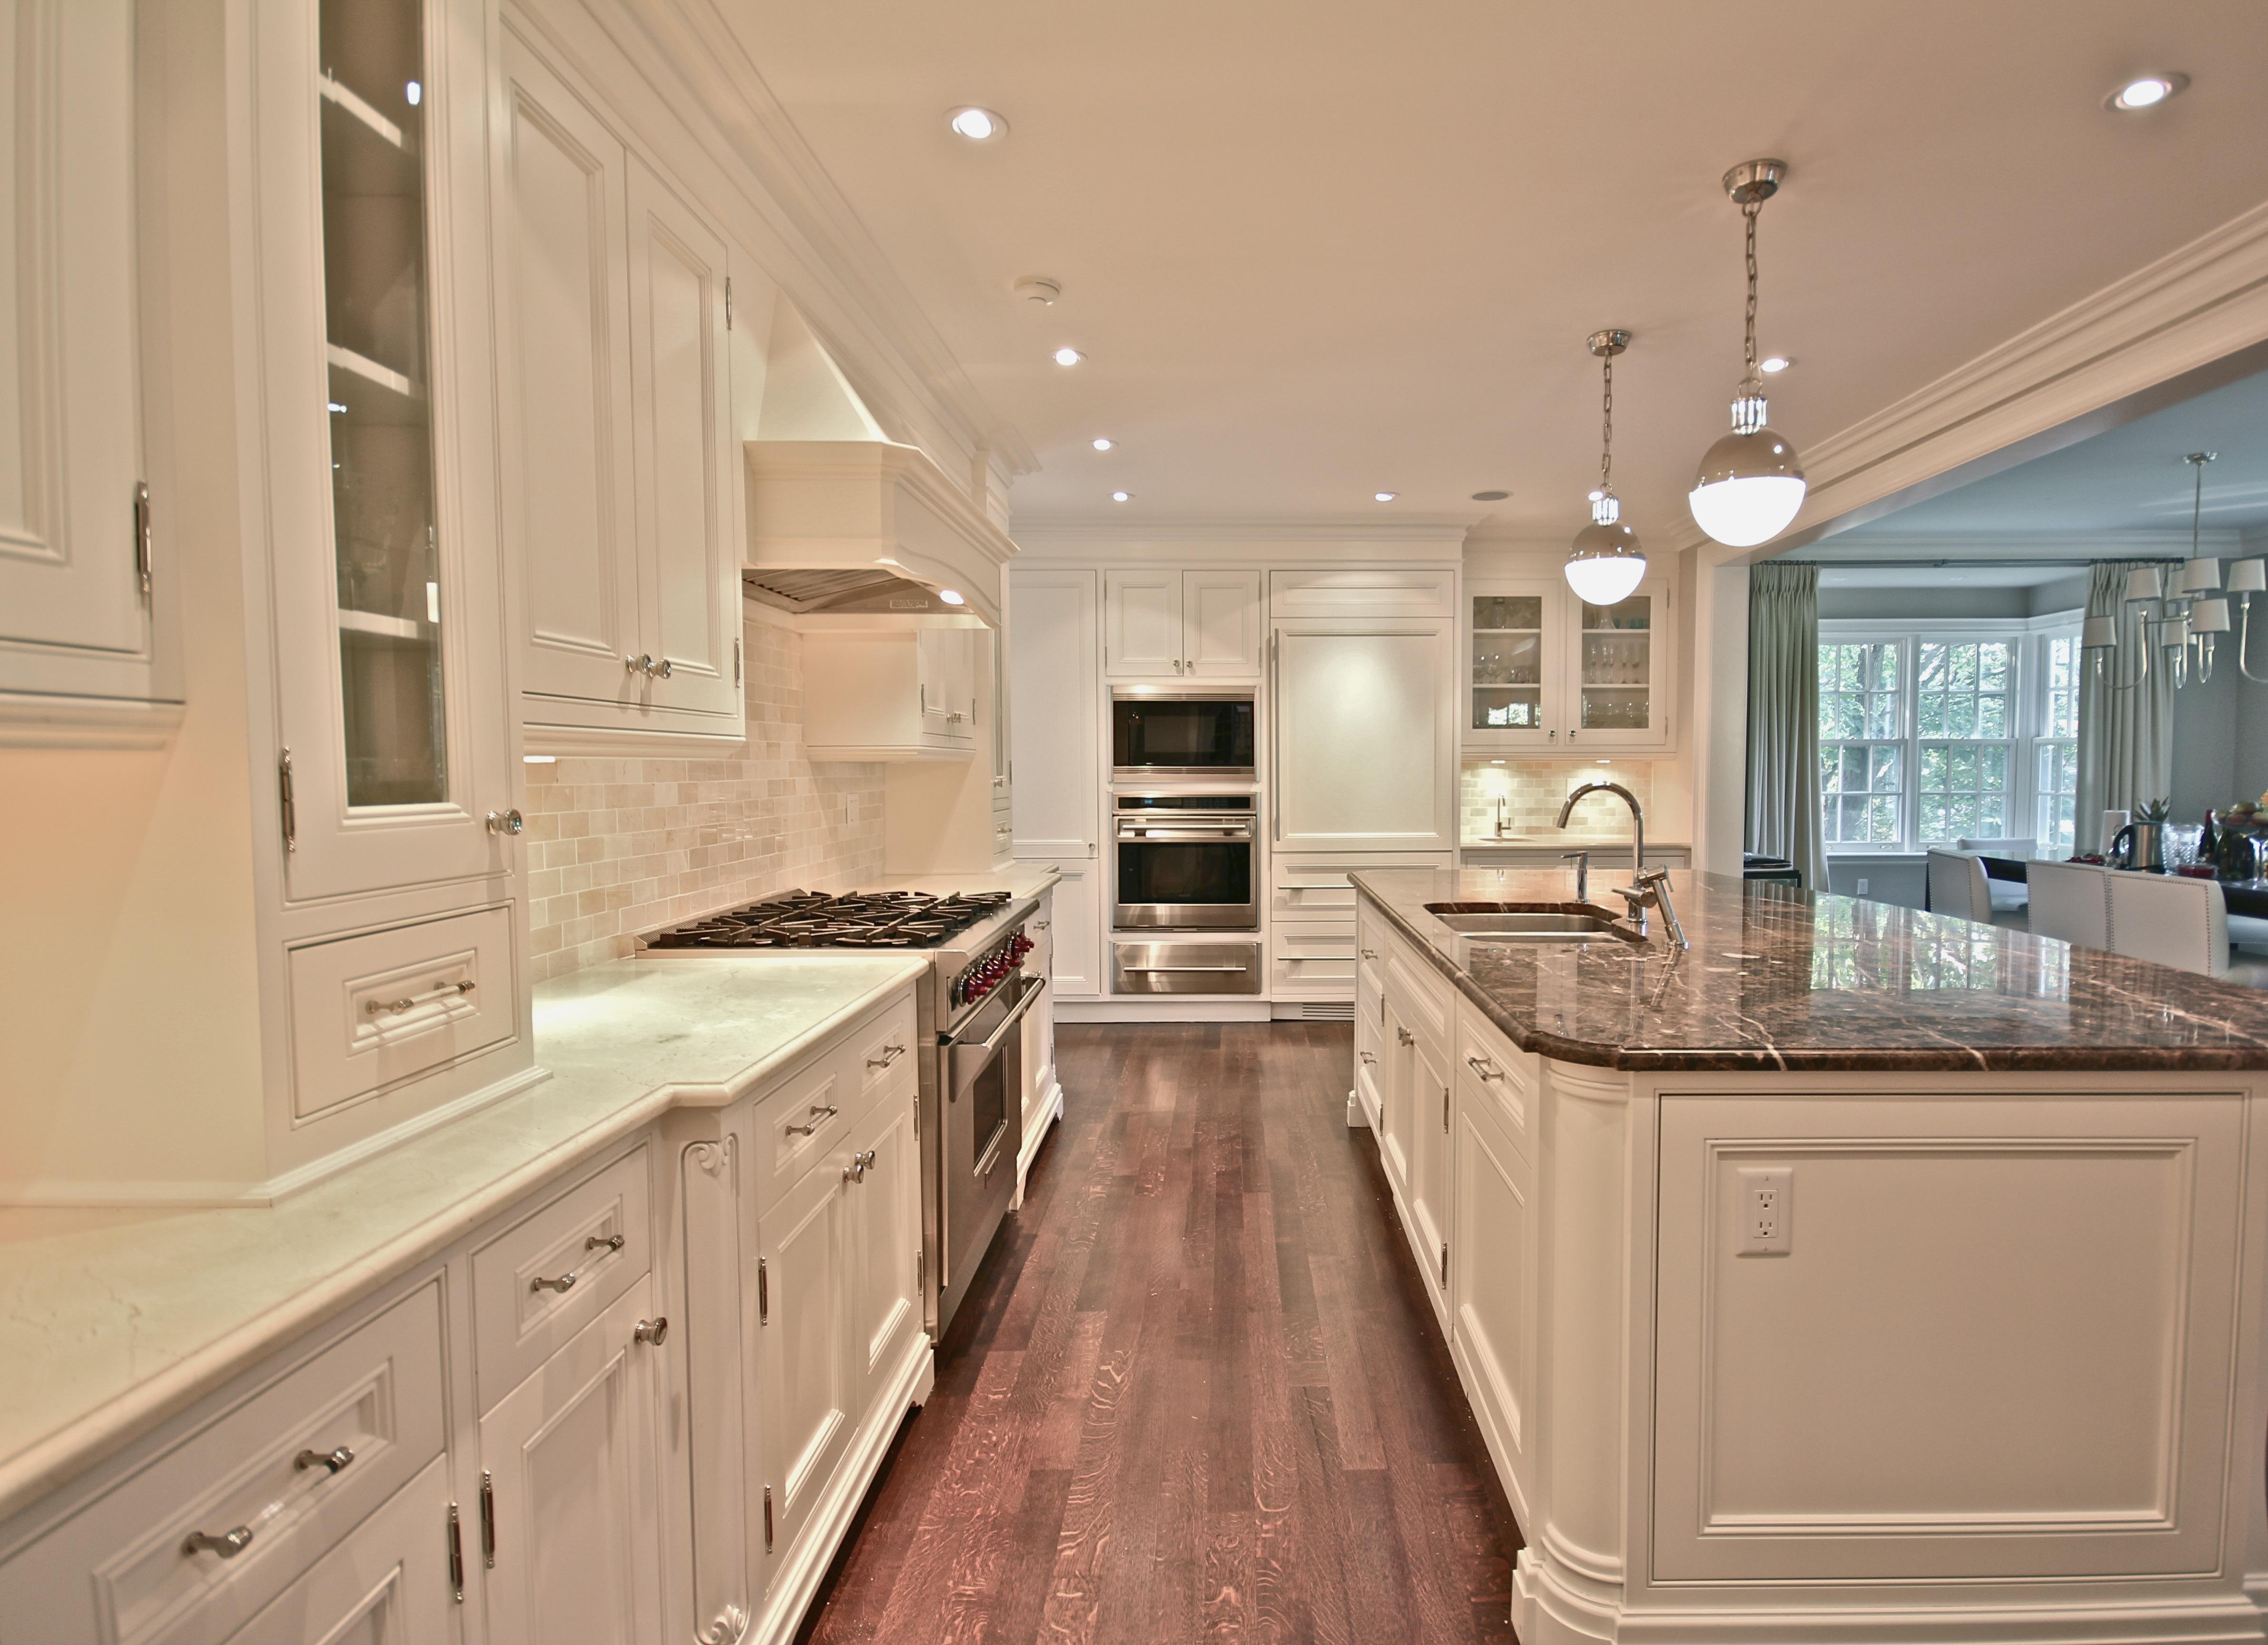 IMG_0350 - PaintCore Kitchen Cabinet Painting Toronto